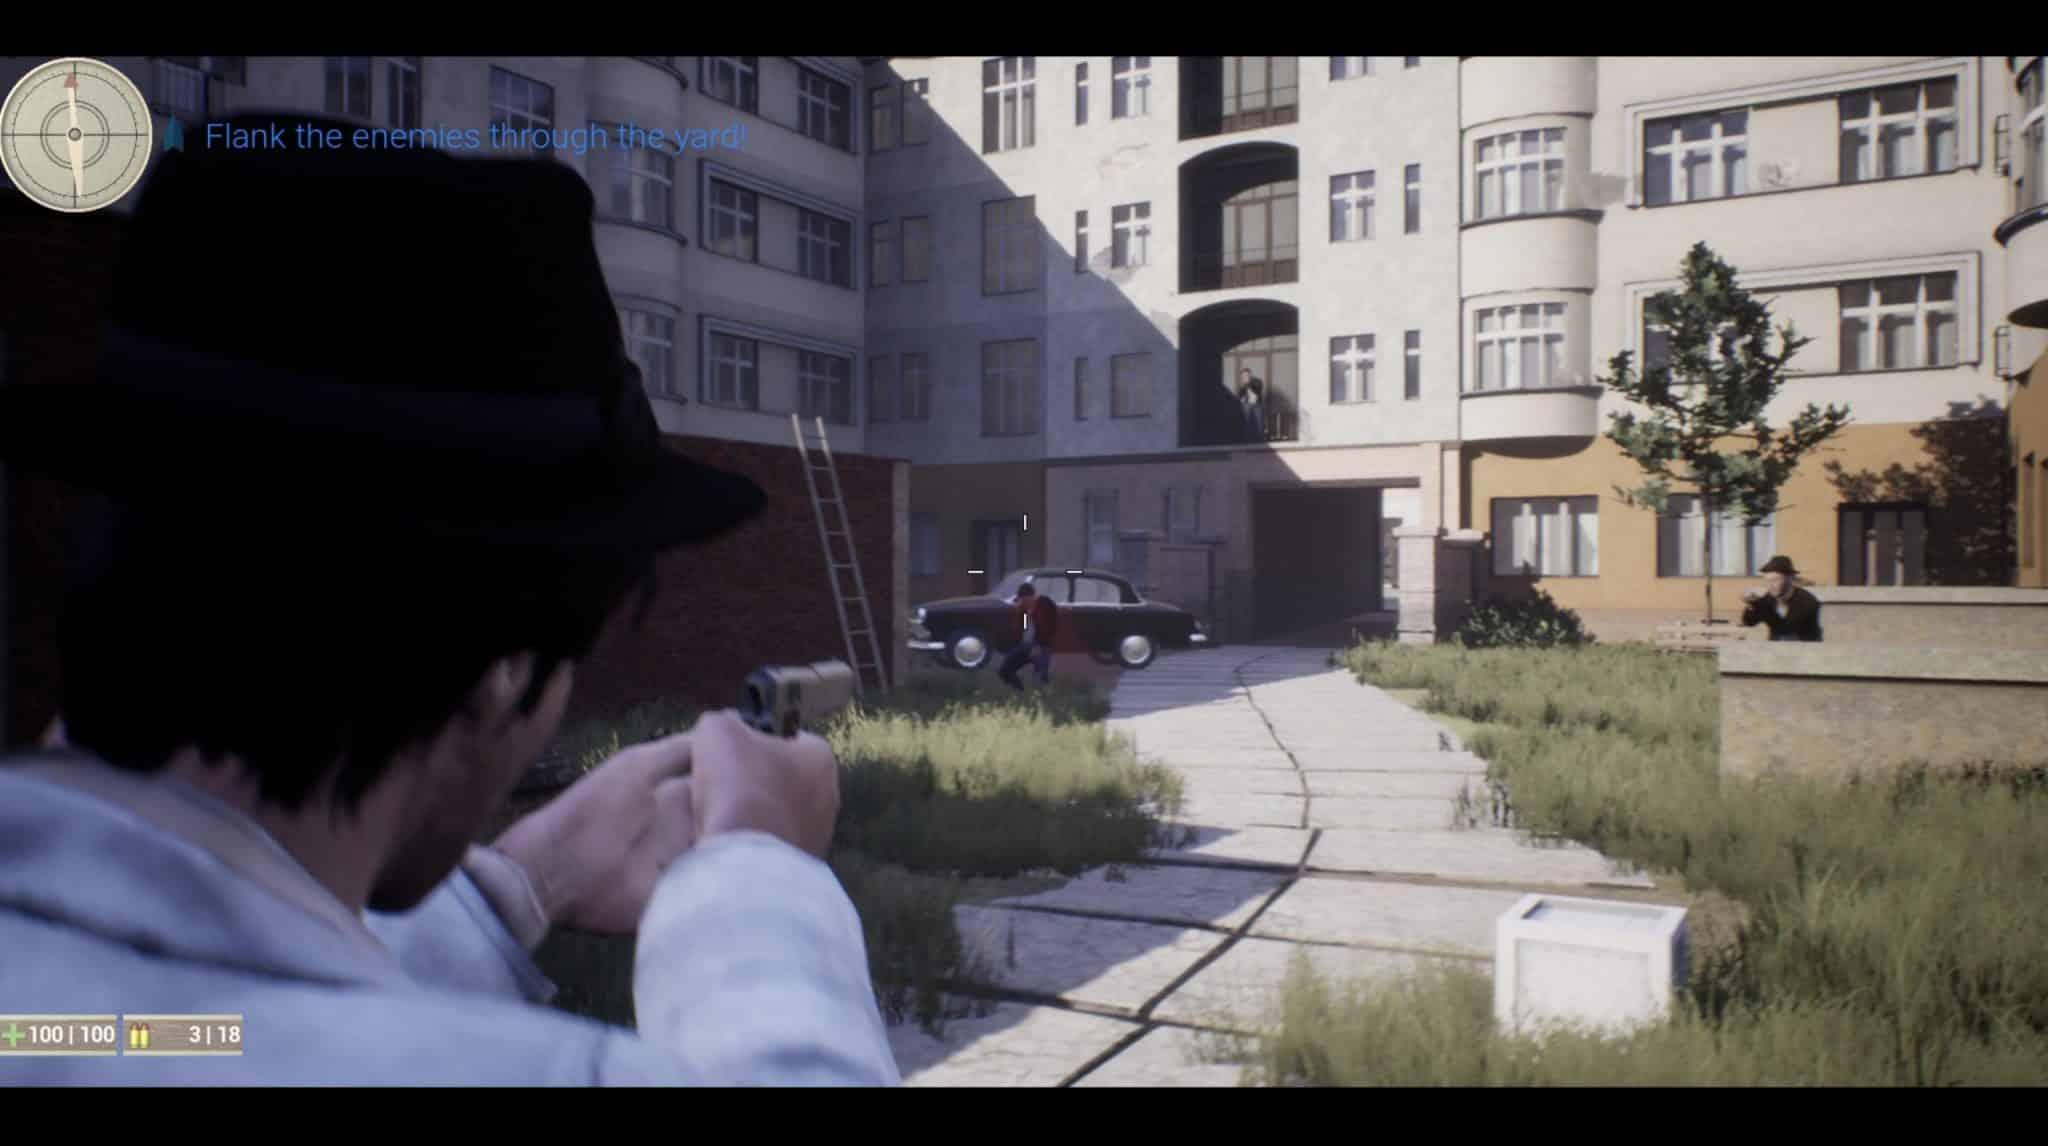 Velvetist - The City of Machine Guns